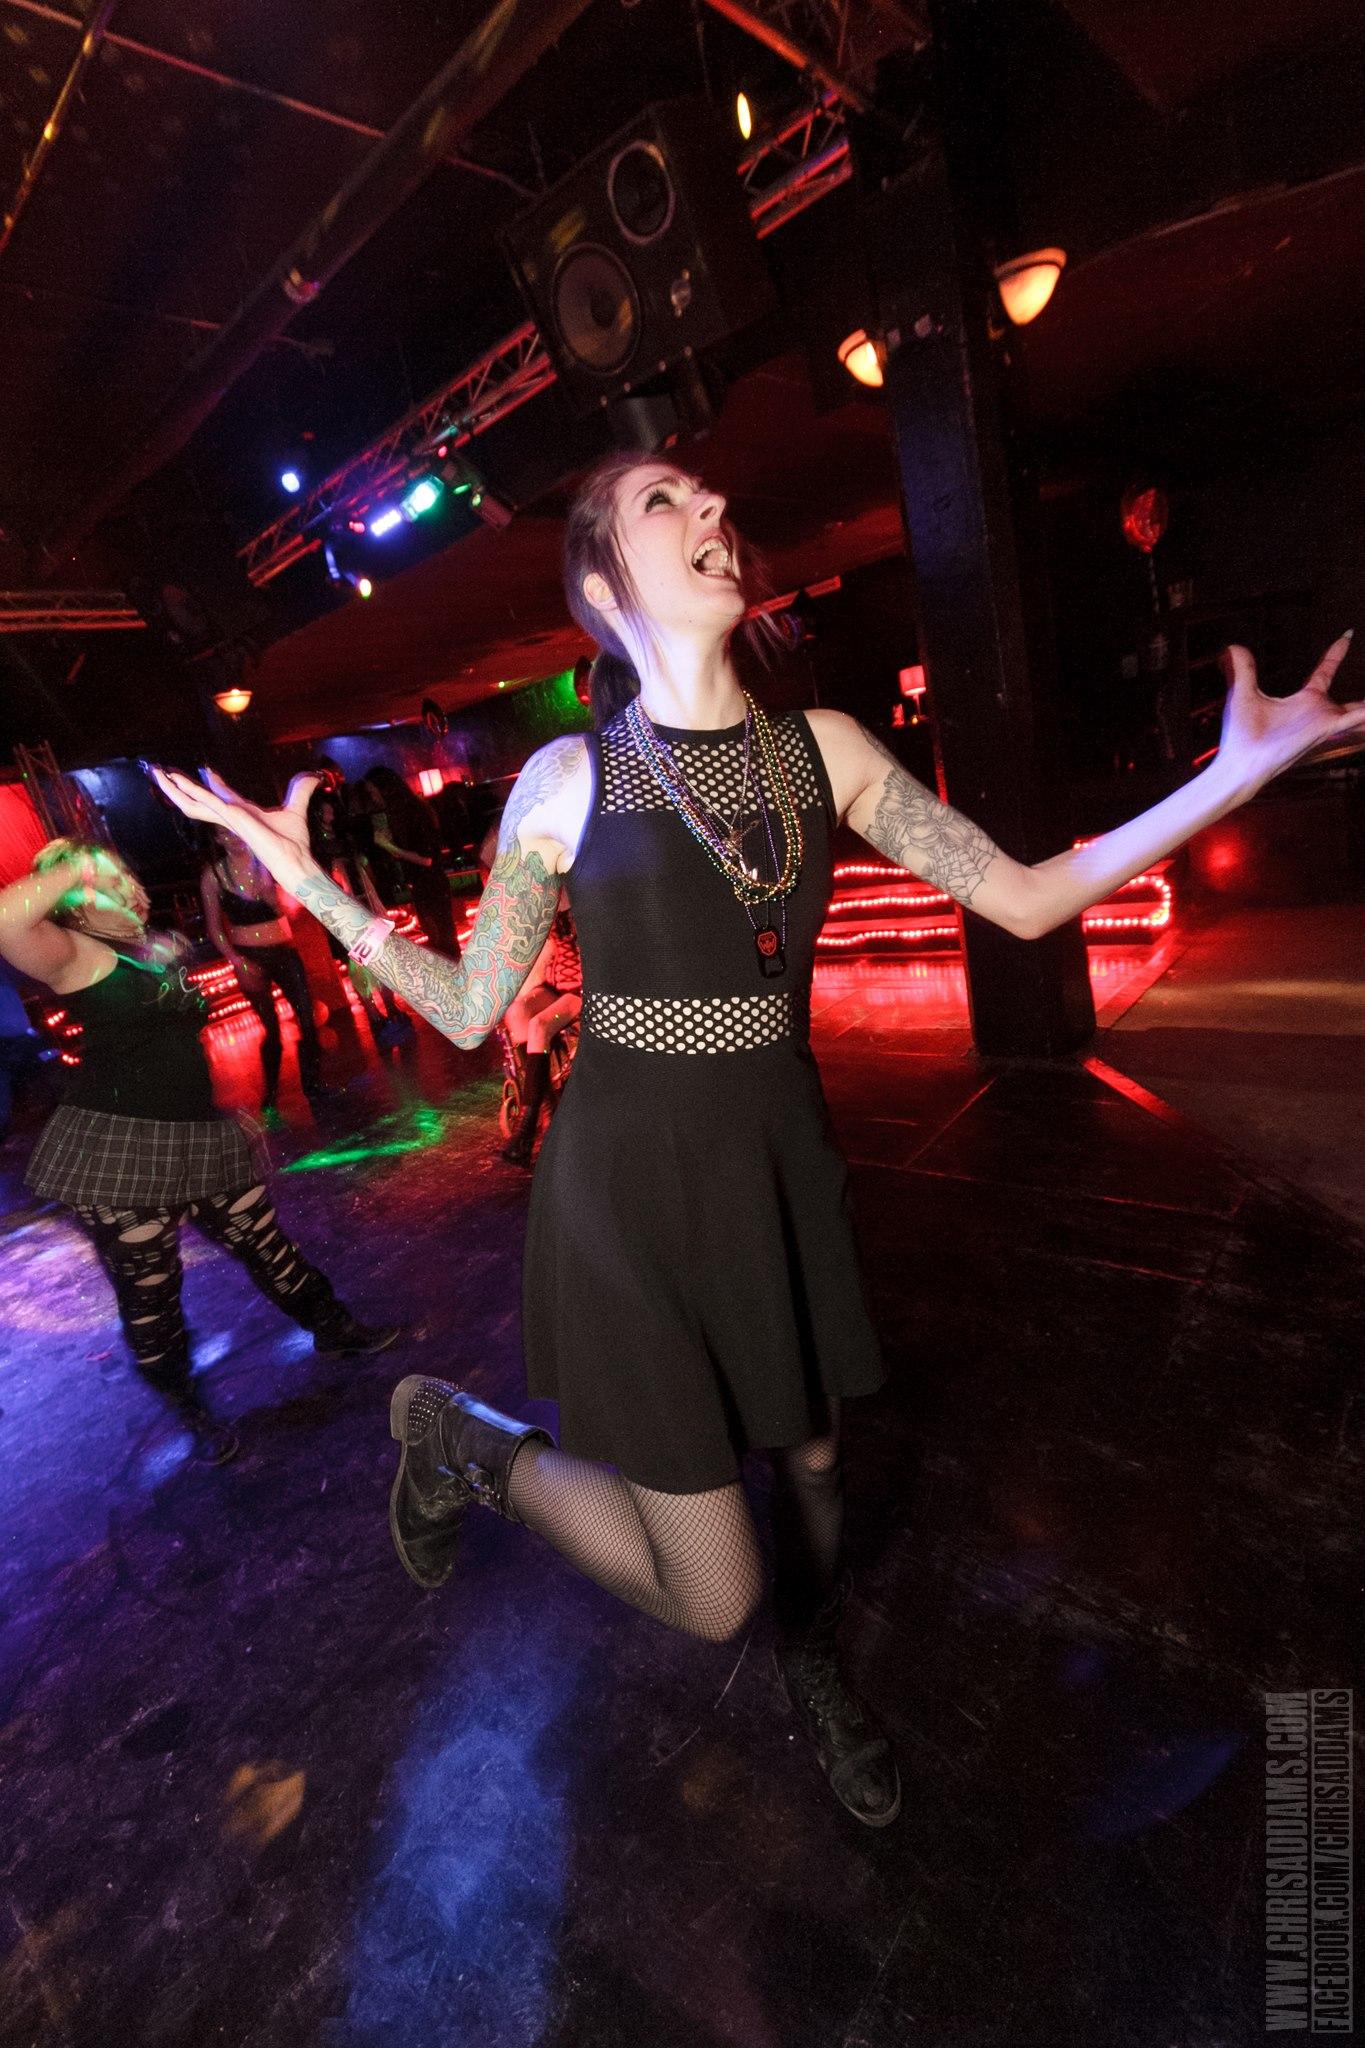 TheHavenClub-Goth-Industrial-Dance-Alternative-Northampton-MA (43).jpg